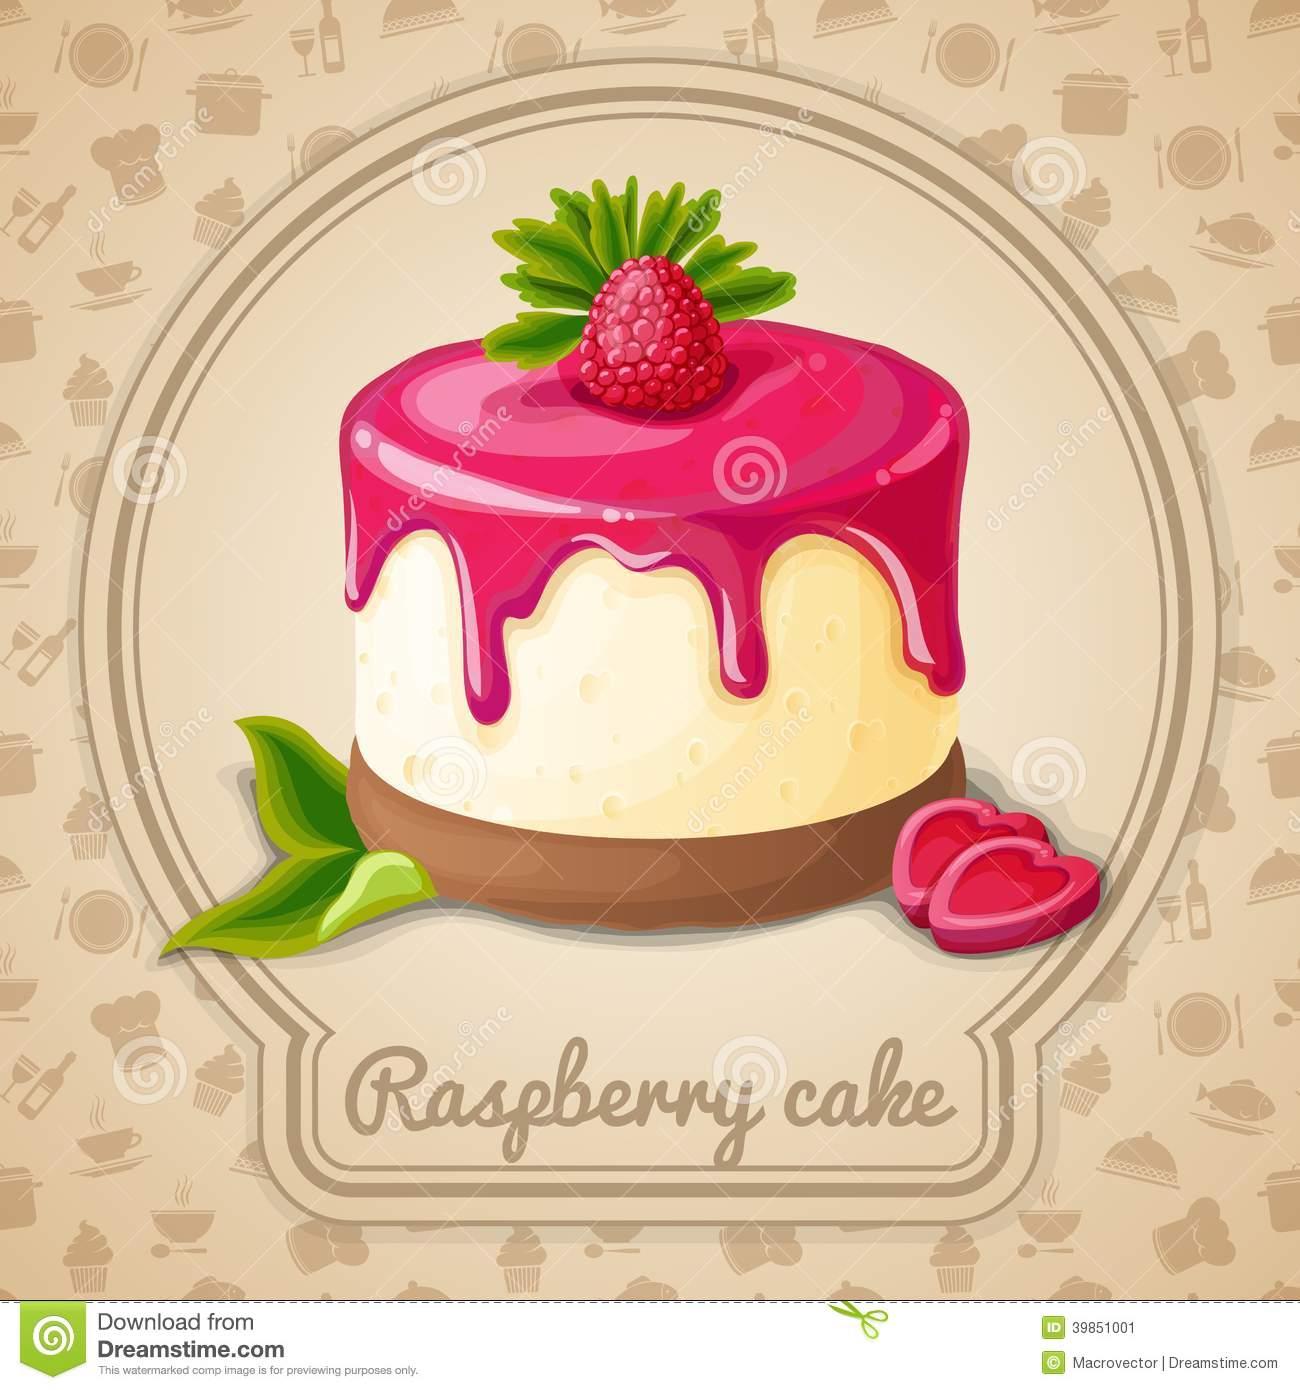 Raspberry Cake Emblem Stock Vector.